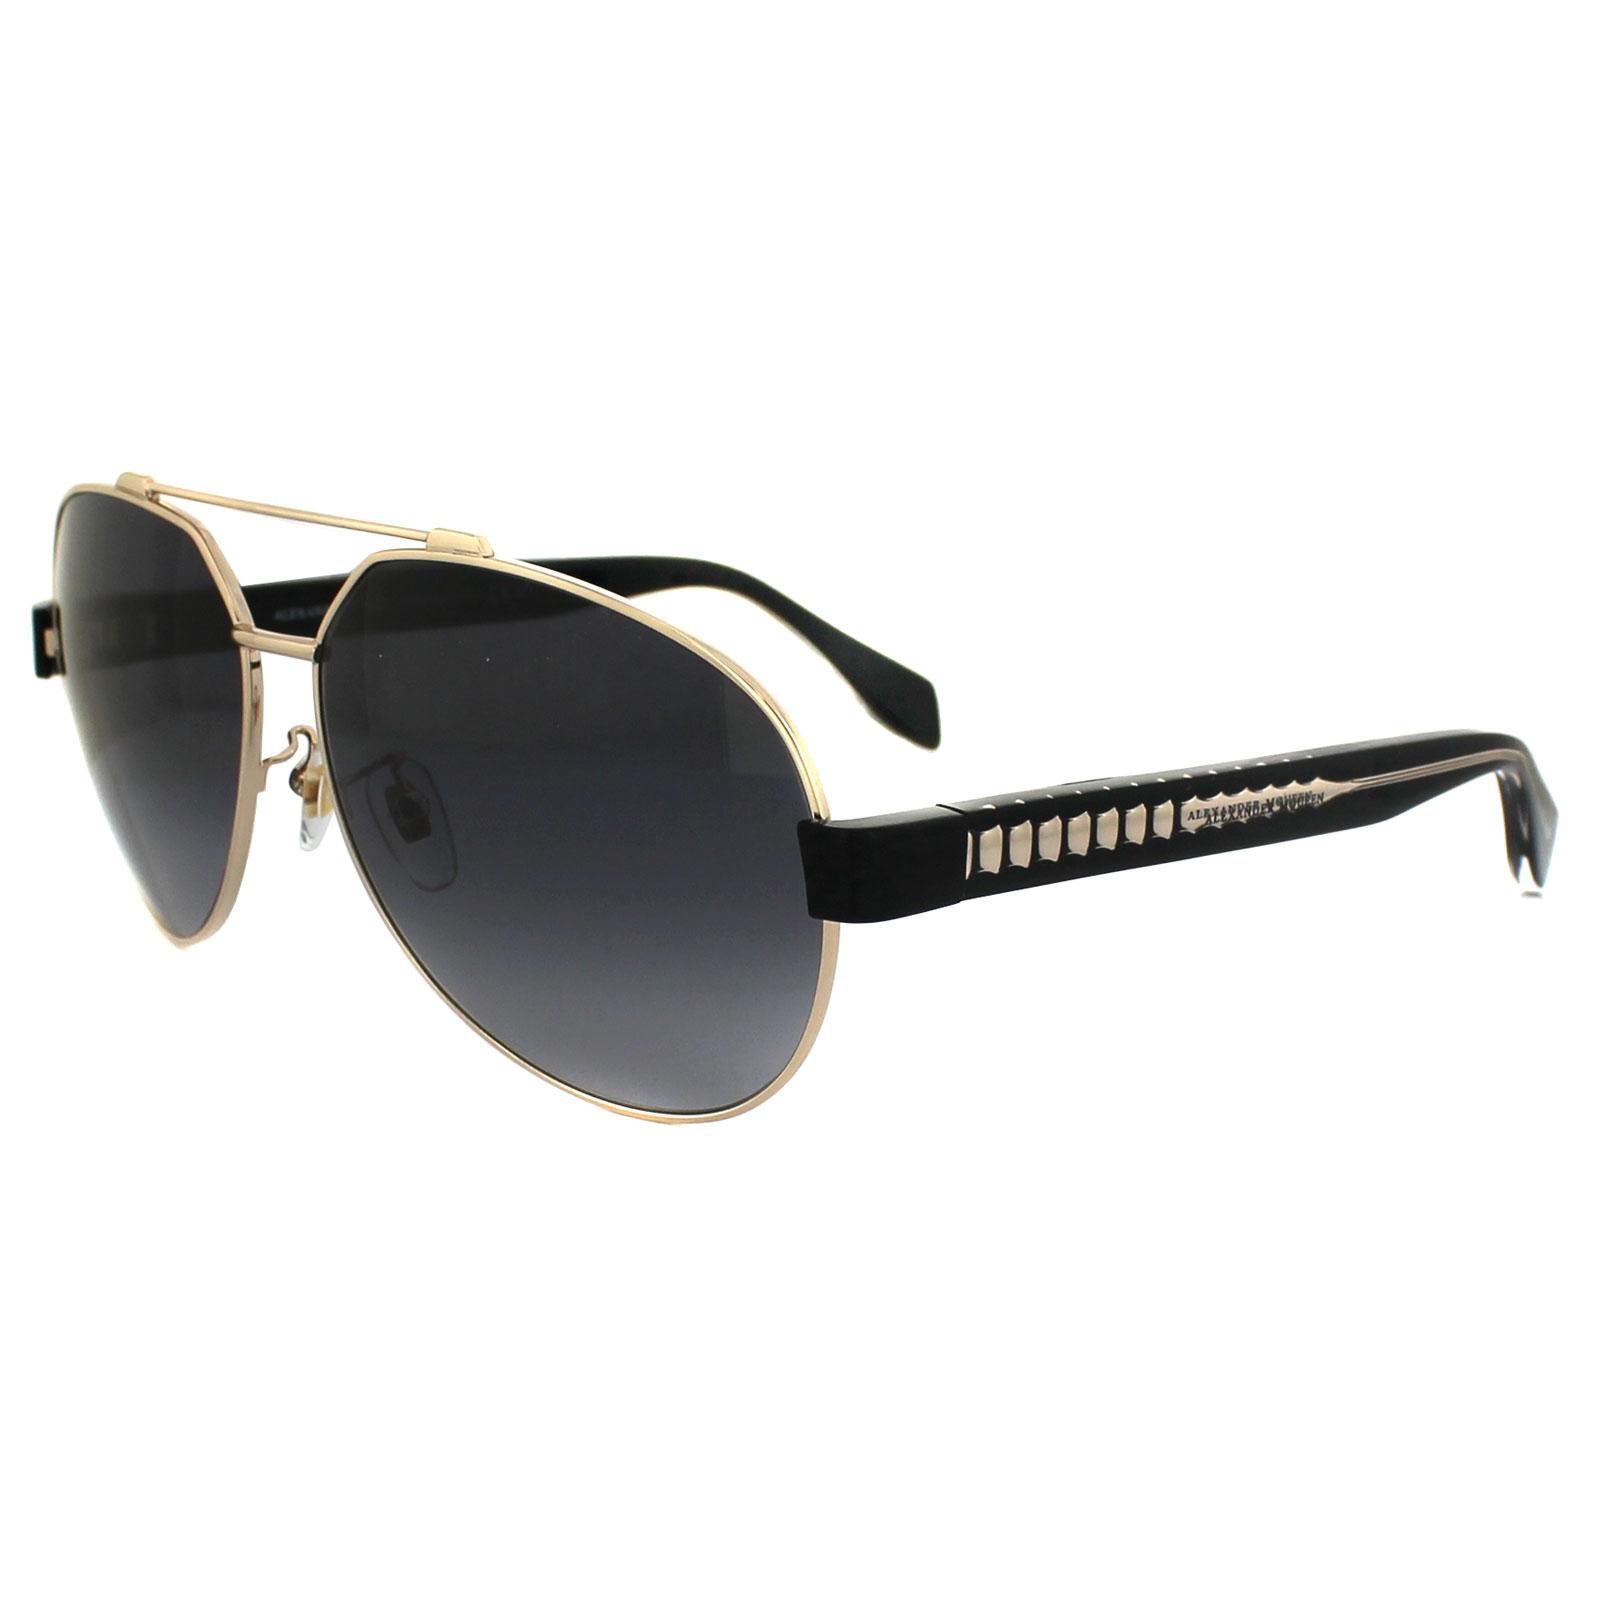 Alexander McQueen 4264/FS Sunglasses